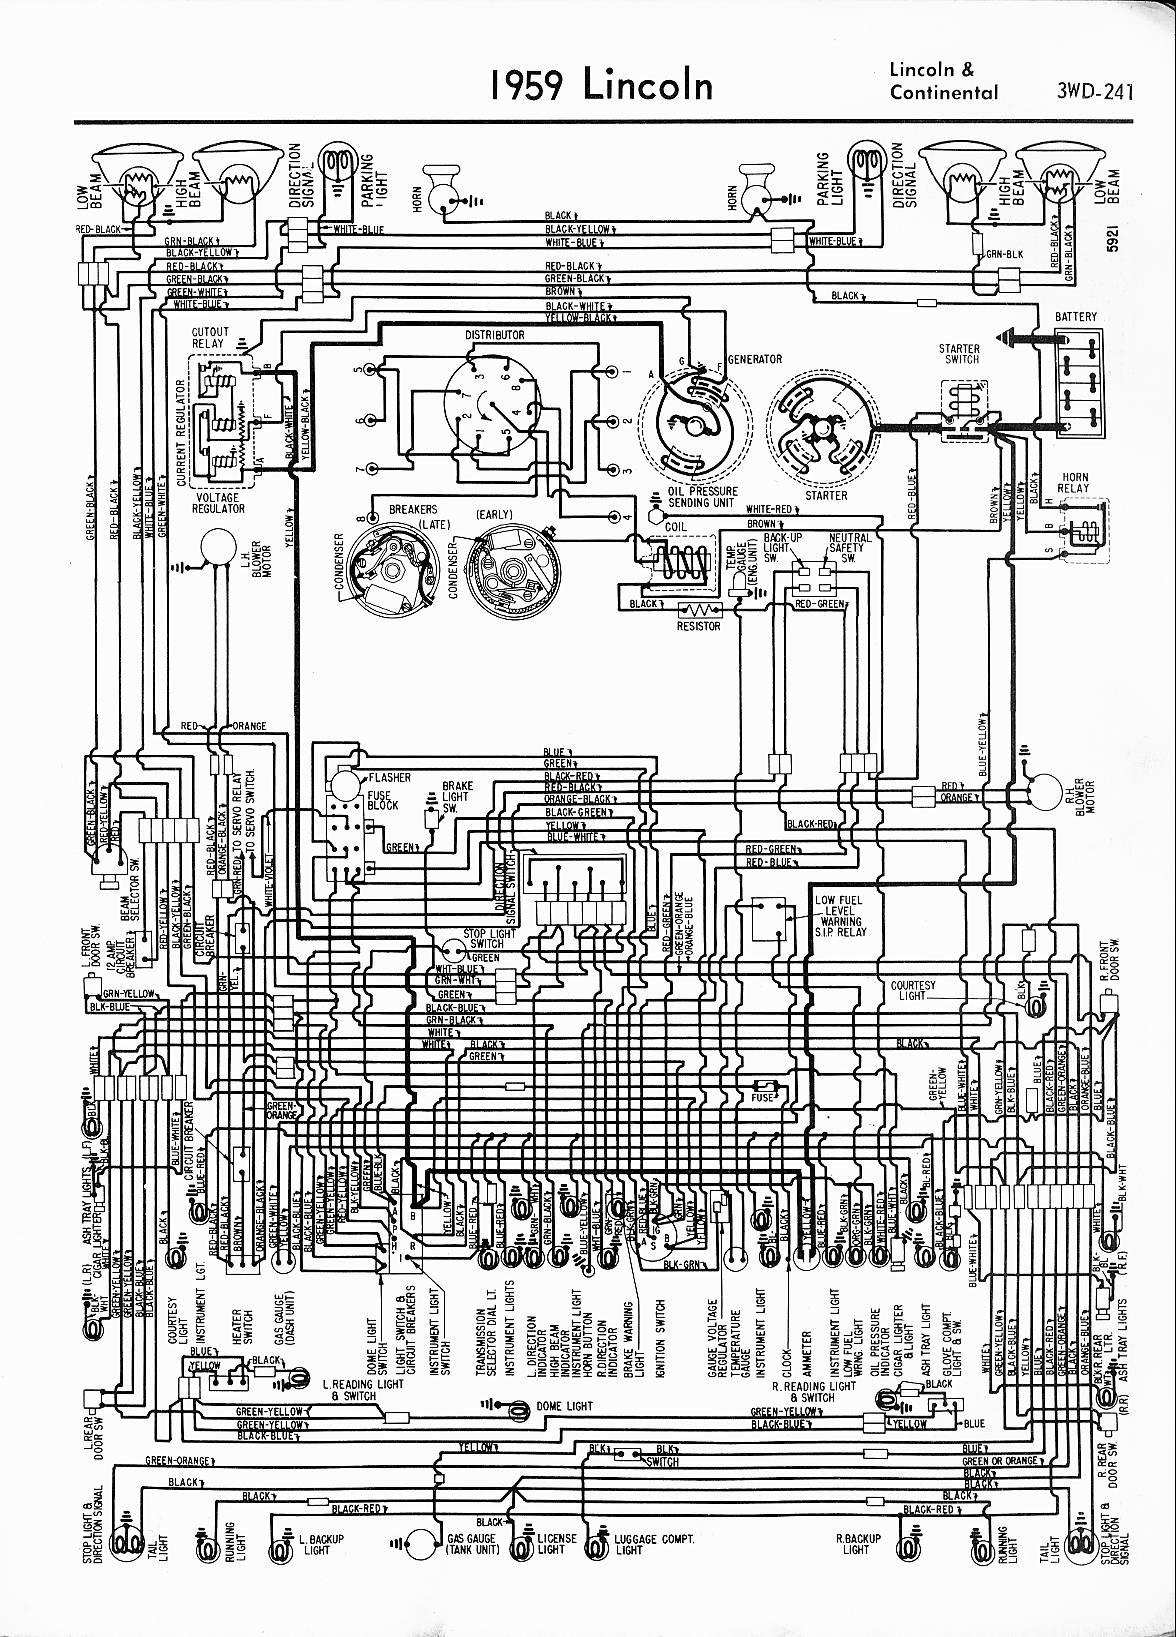 Astounding Buick Rendezvous Wiring Guide Furthermore Worksheets For Wiring Cloud Xempagosophoxytasticioscodnessplanboapumohammedshrineorg